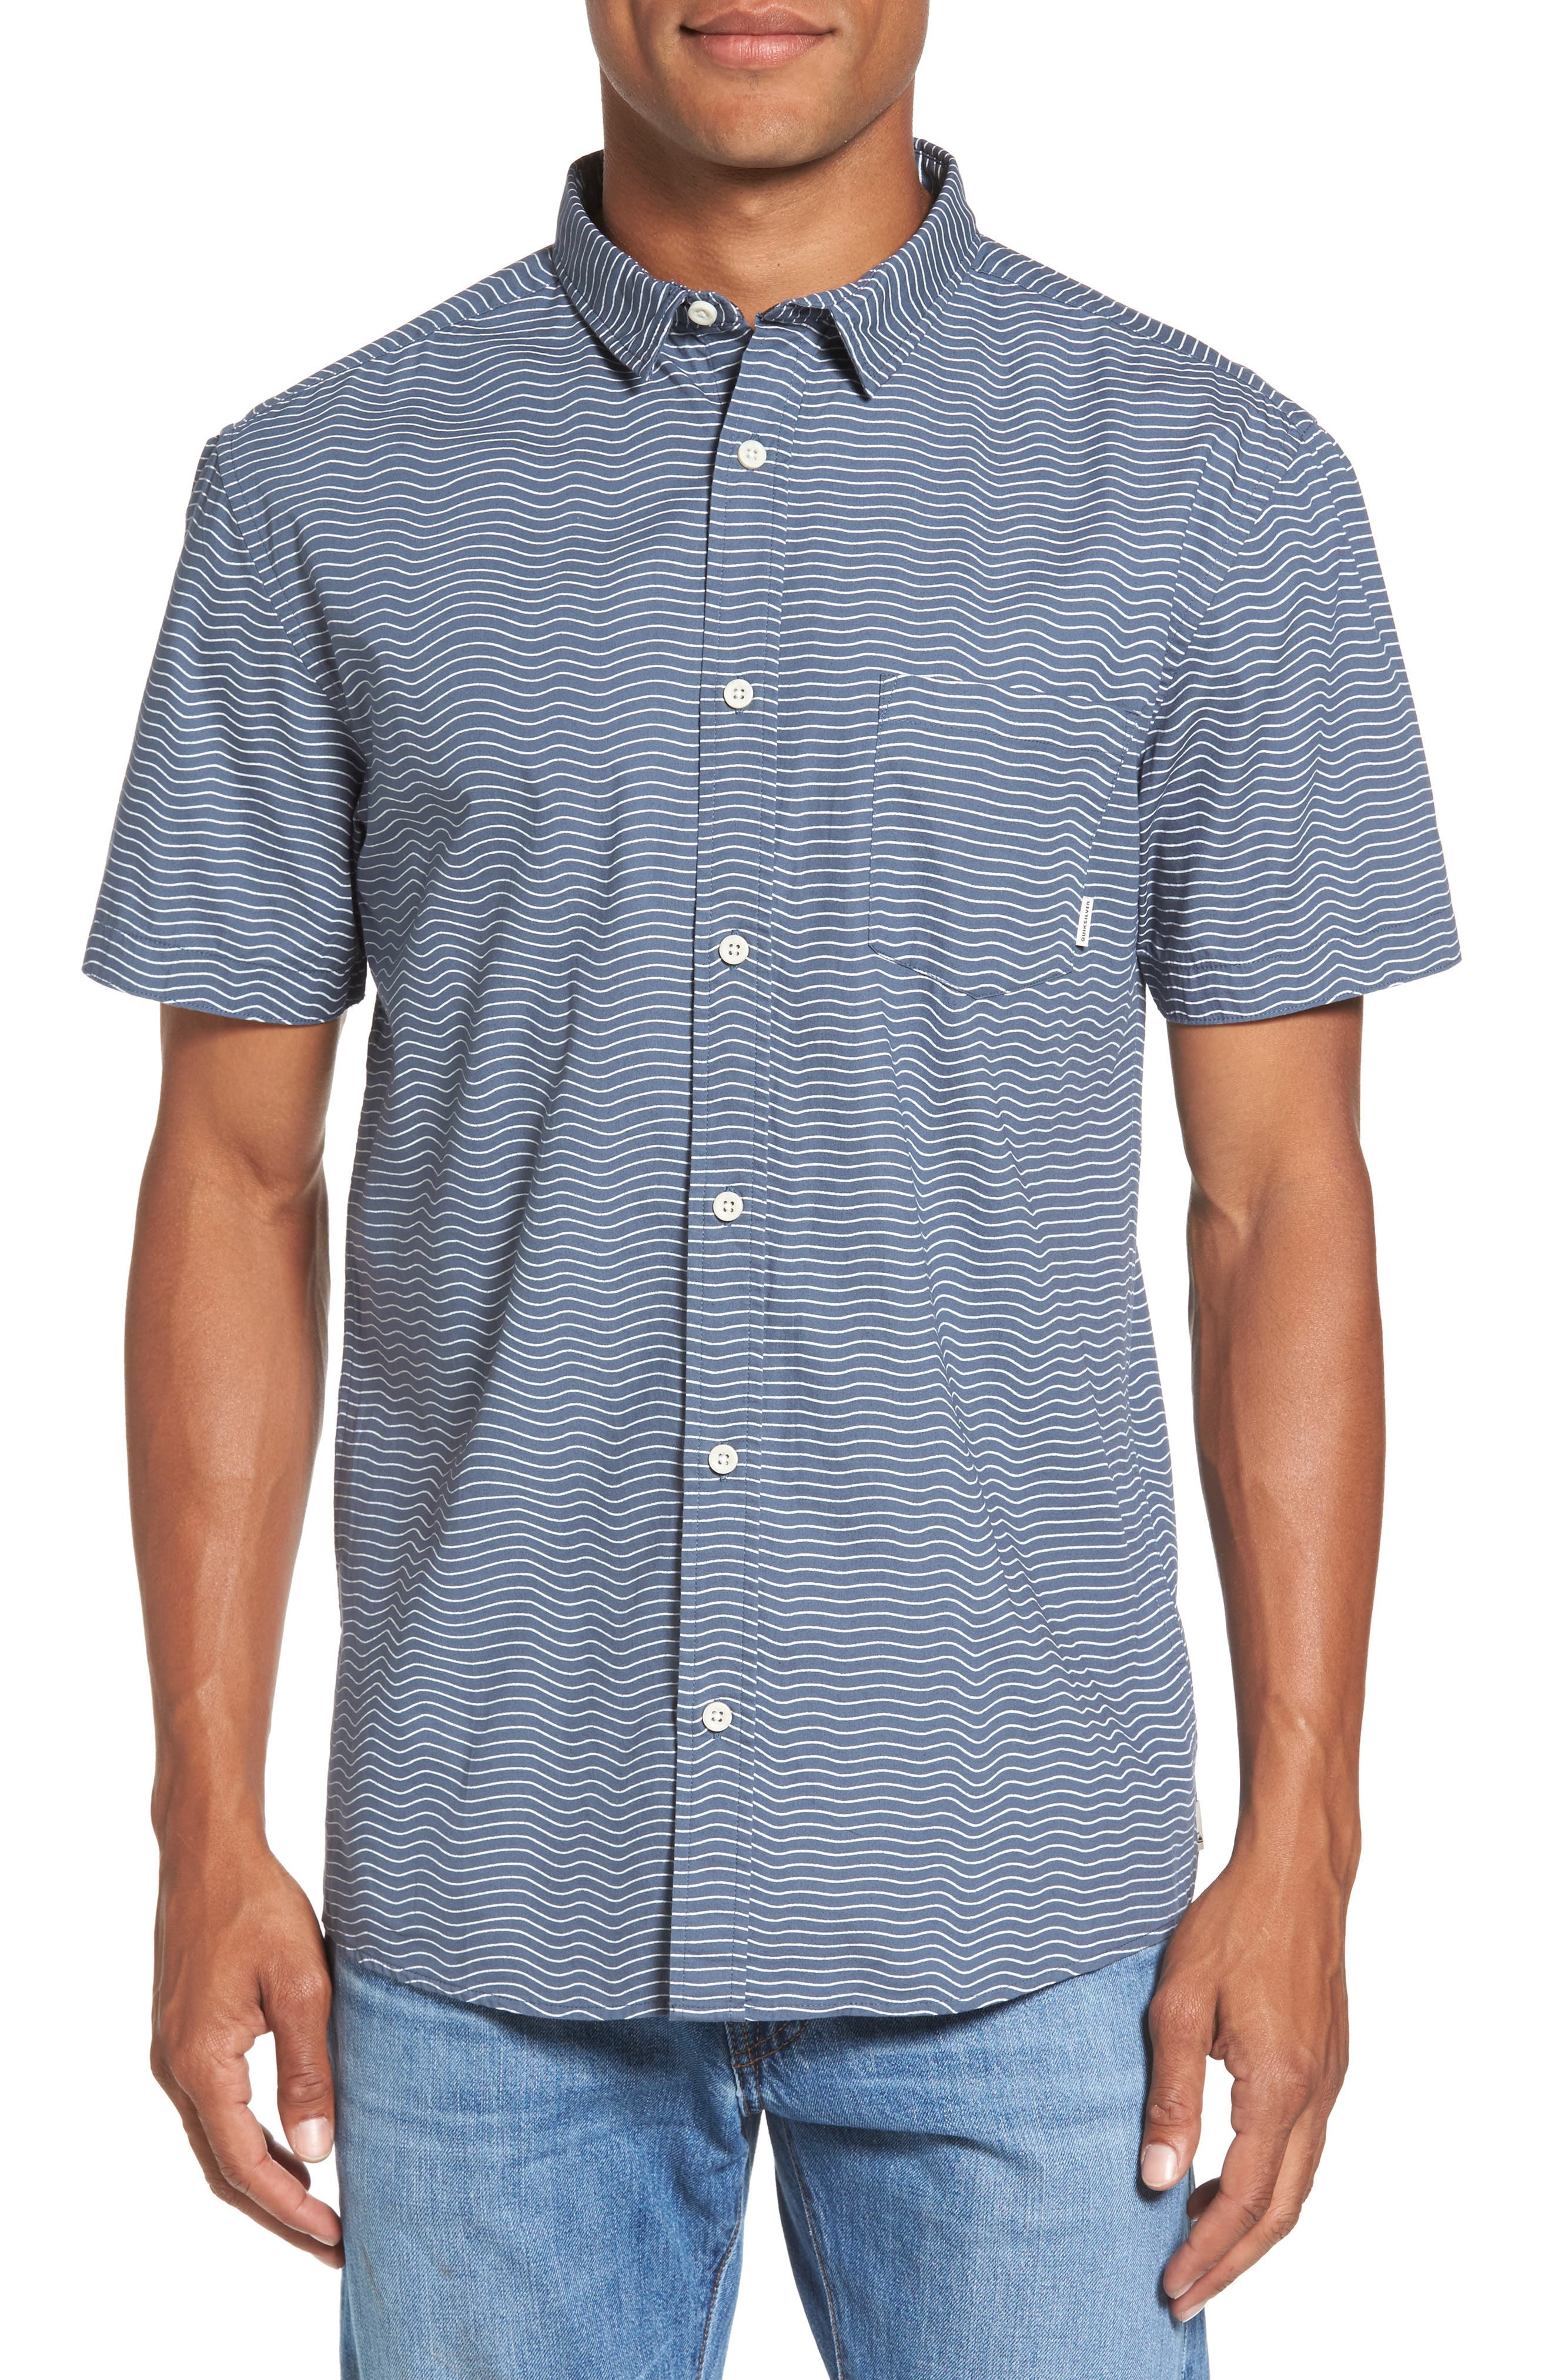 Main Image - Quiksilver Heat Wave Stripe Shirt